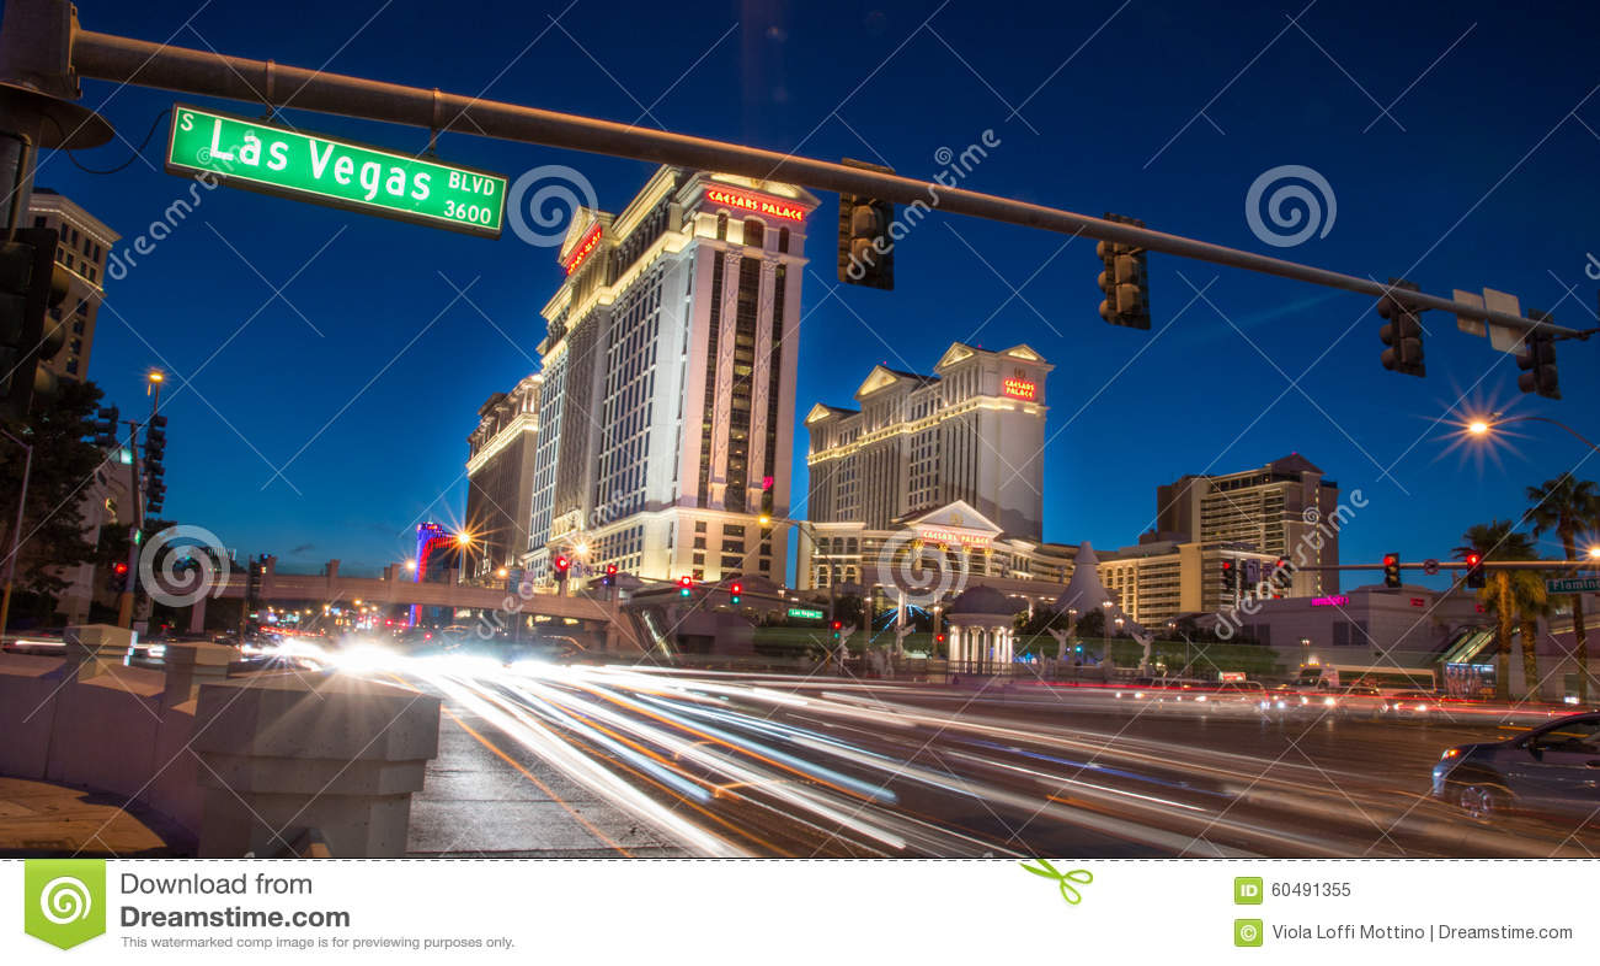 10 Mejores Hoteles en Las Vegas, Nevada - Hotelescom